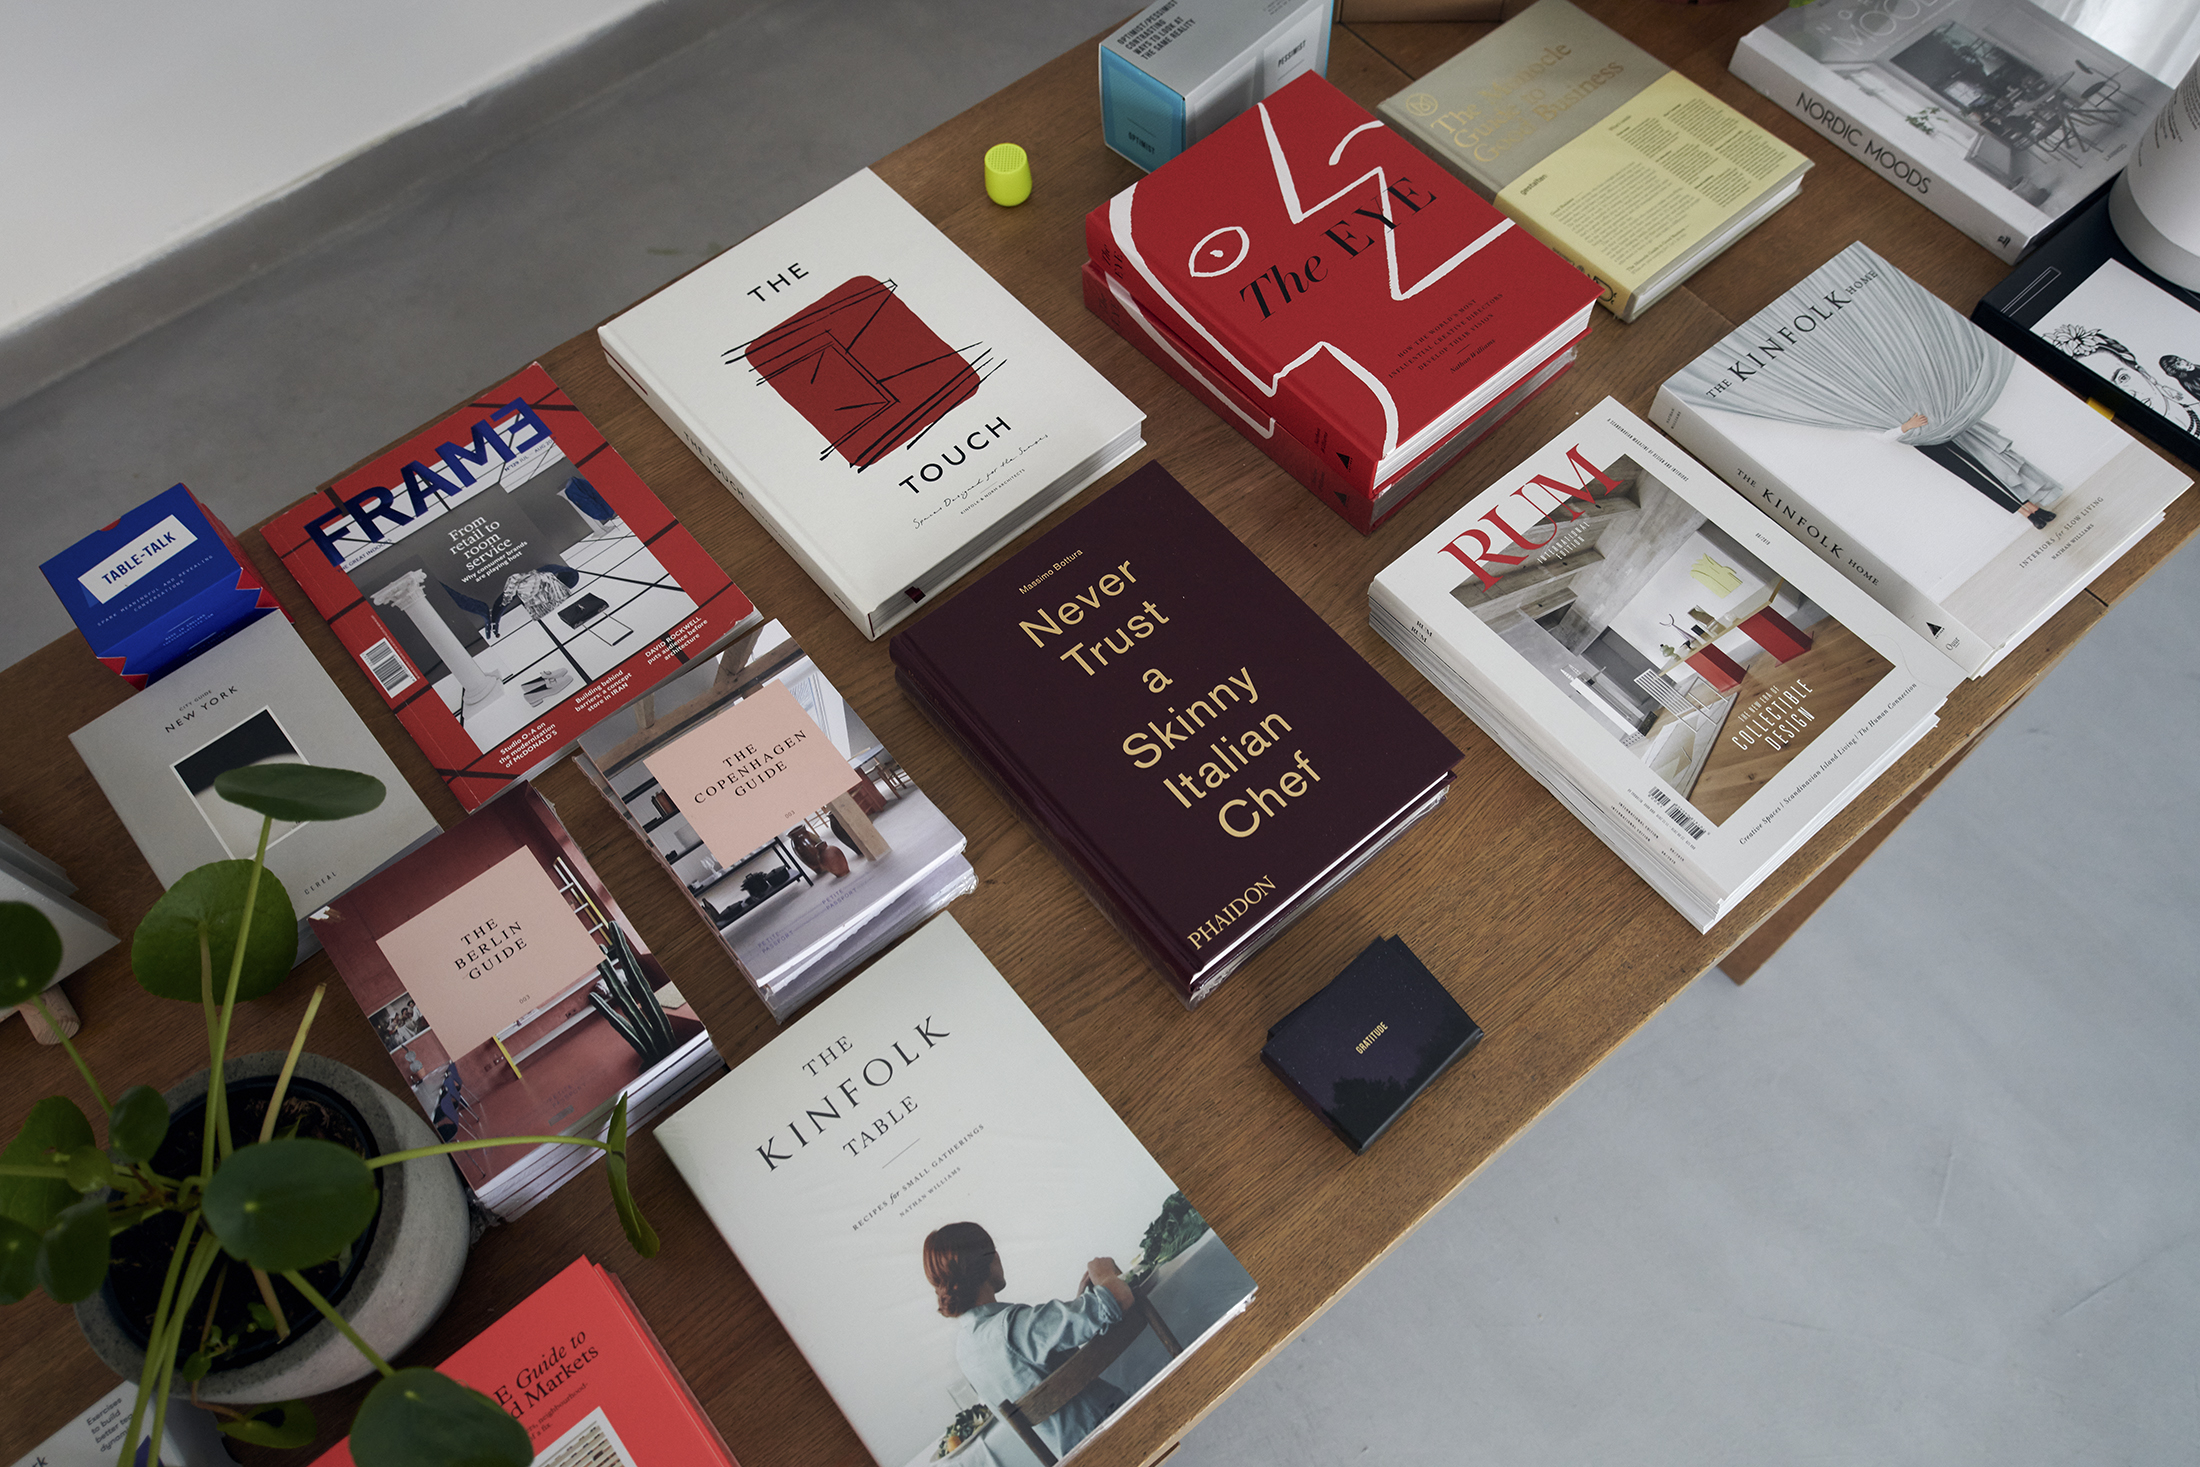 Selectedd literatura